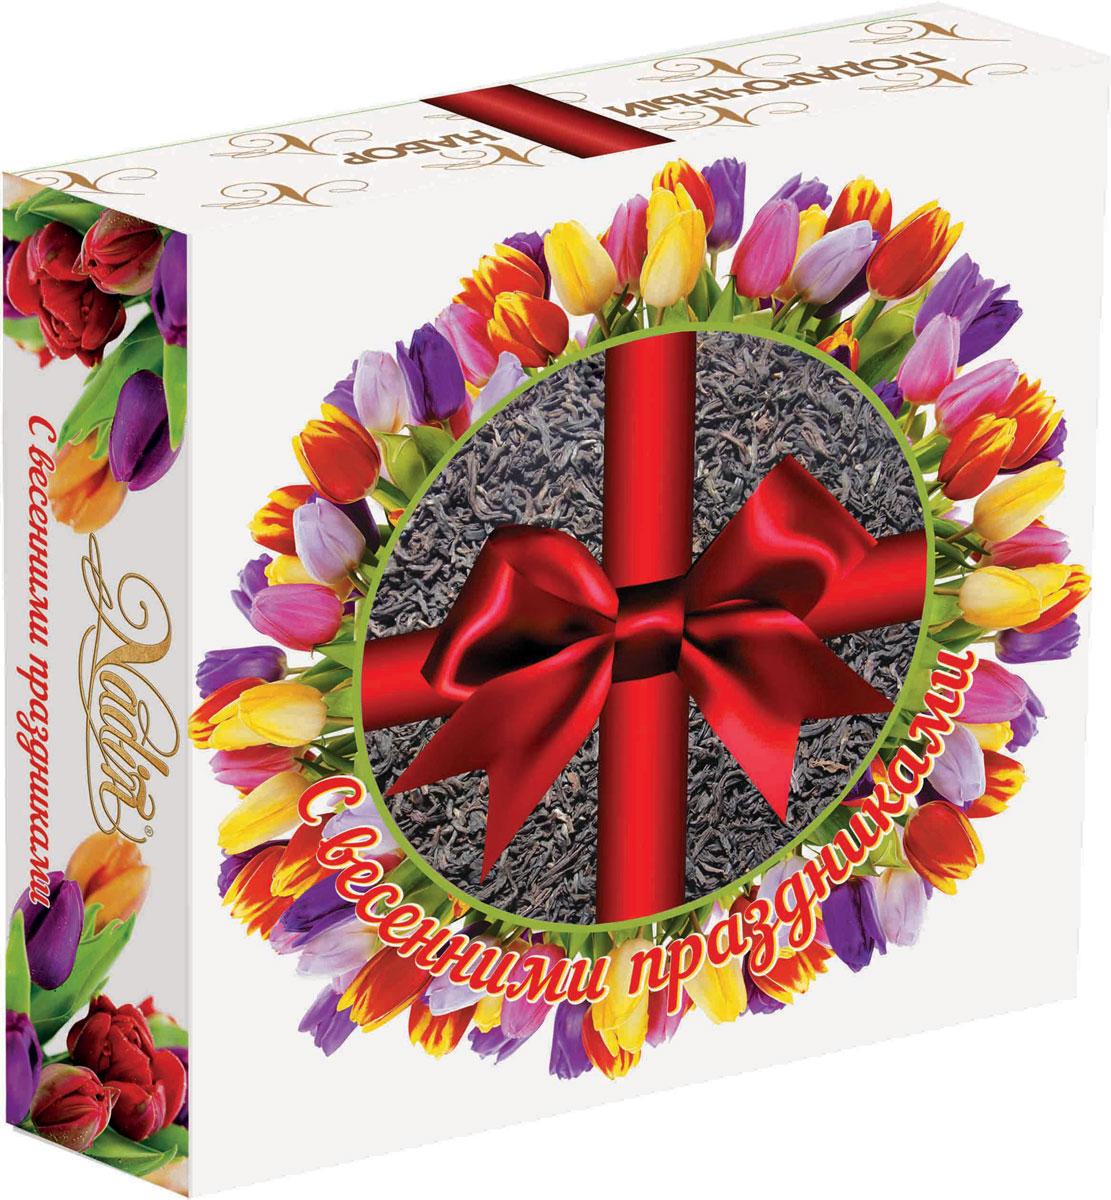 Nadin Подарочный набор 4 вида чая, 200 г nadin подарочный набор 4 вида чая 200 г